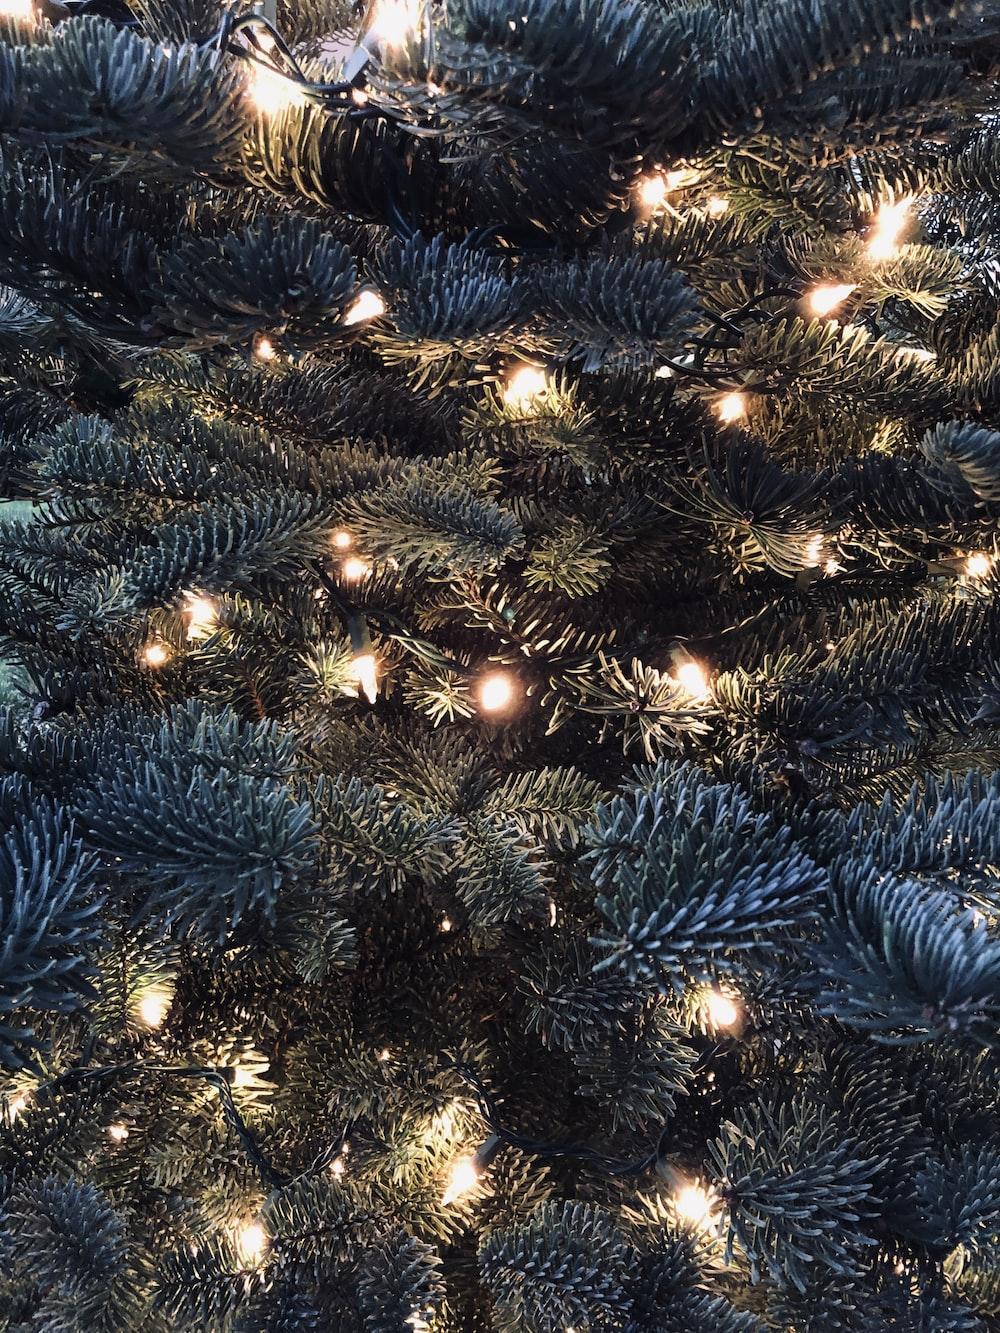 green Christmas tree with LED light